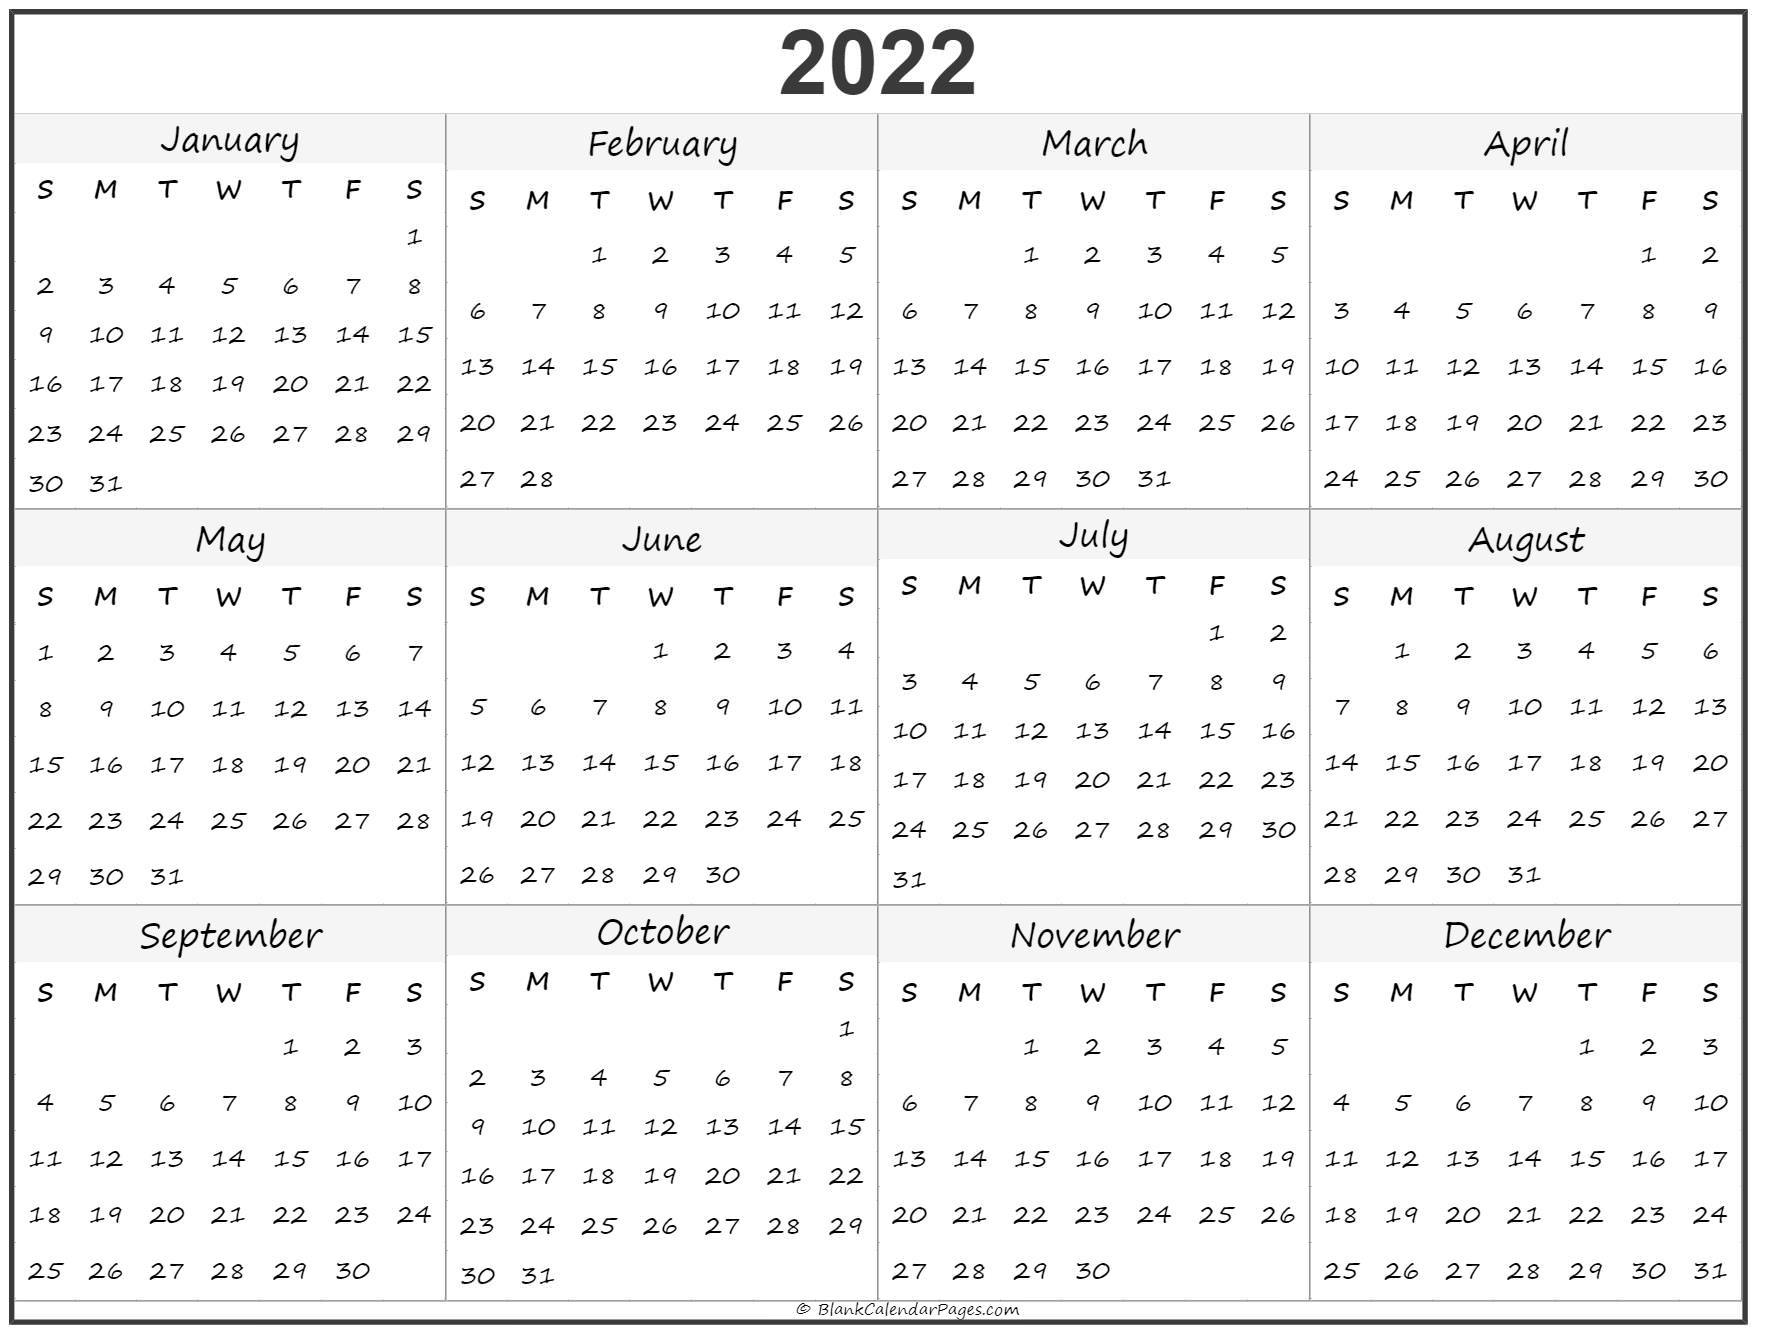 2022 Year Calendar   Yearly Printable regarding Blank Year Long Calendar 2022